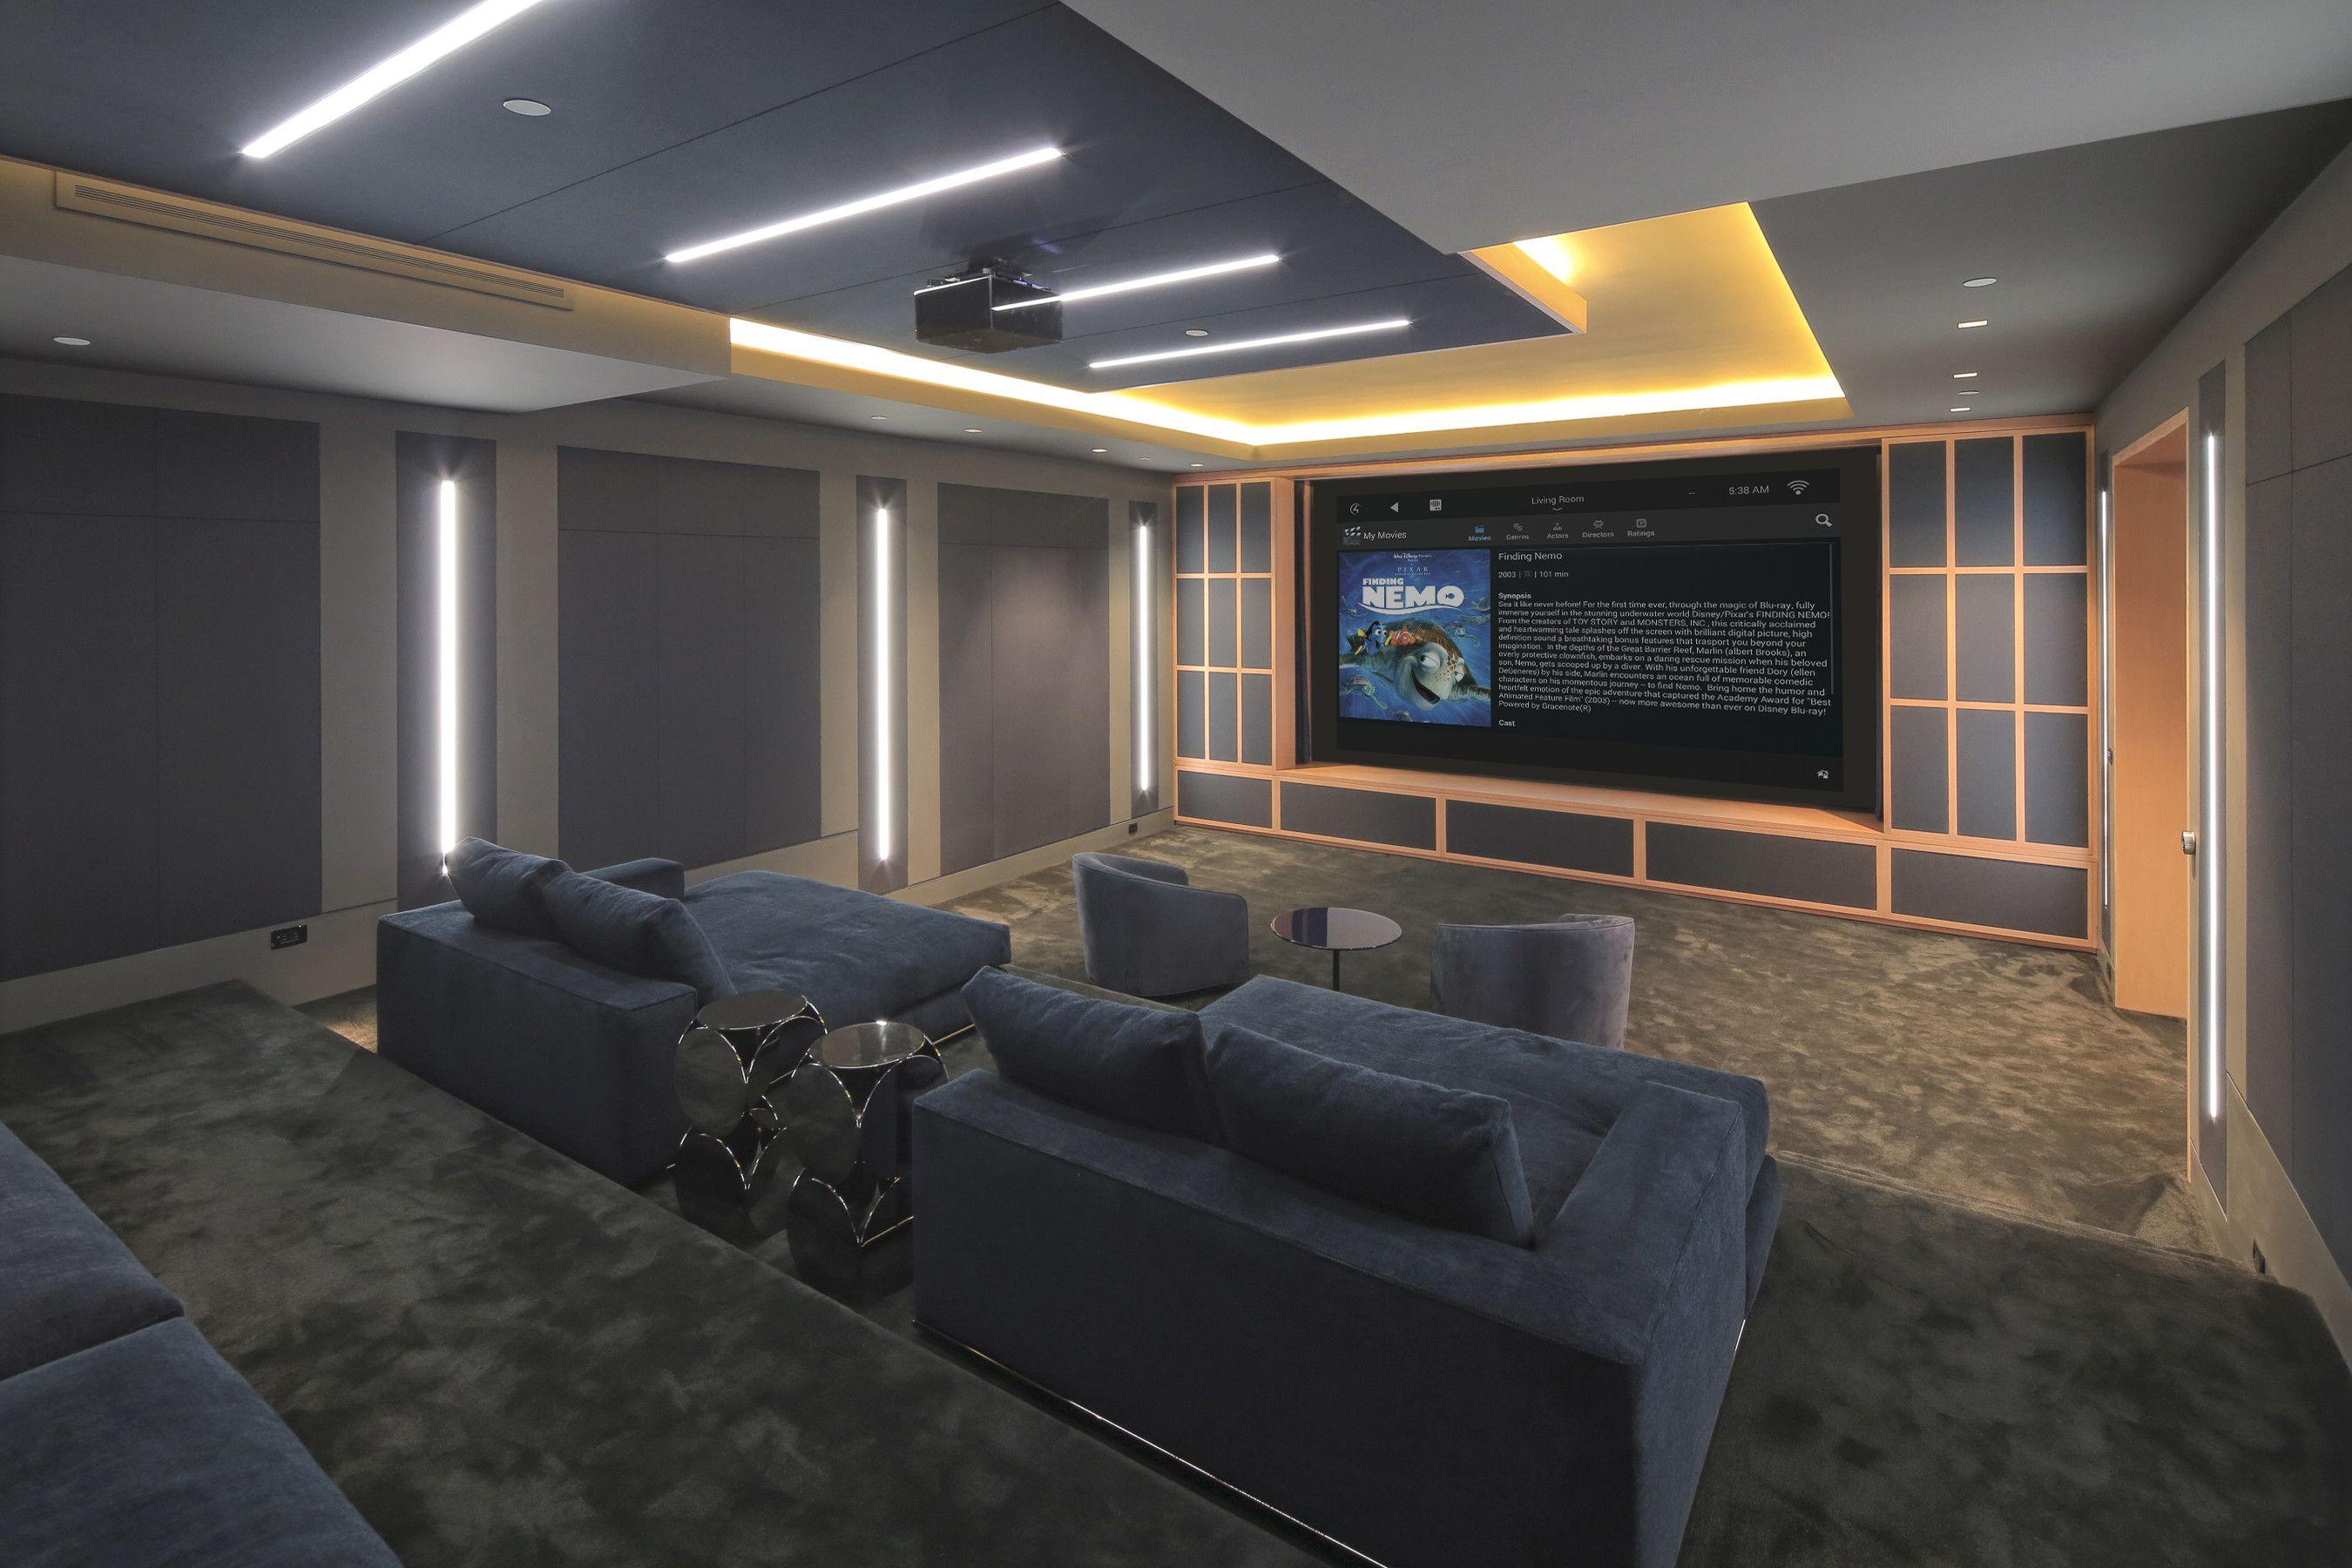 Pin von Futurian Systems auf Media/Theater Rooms | Pinterest